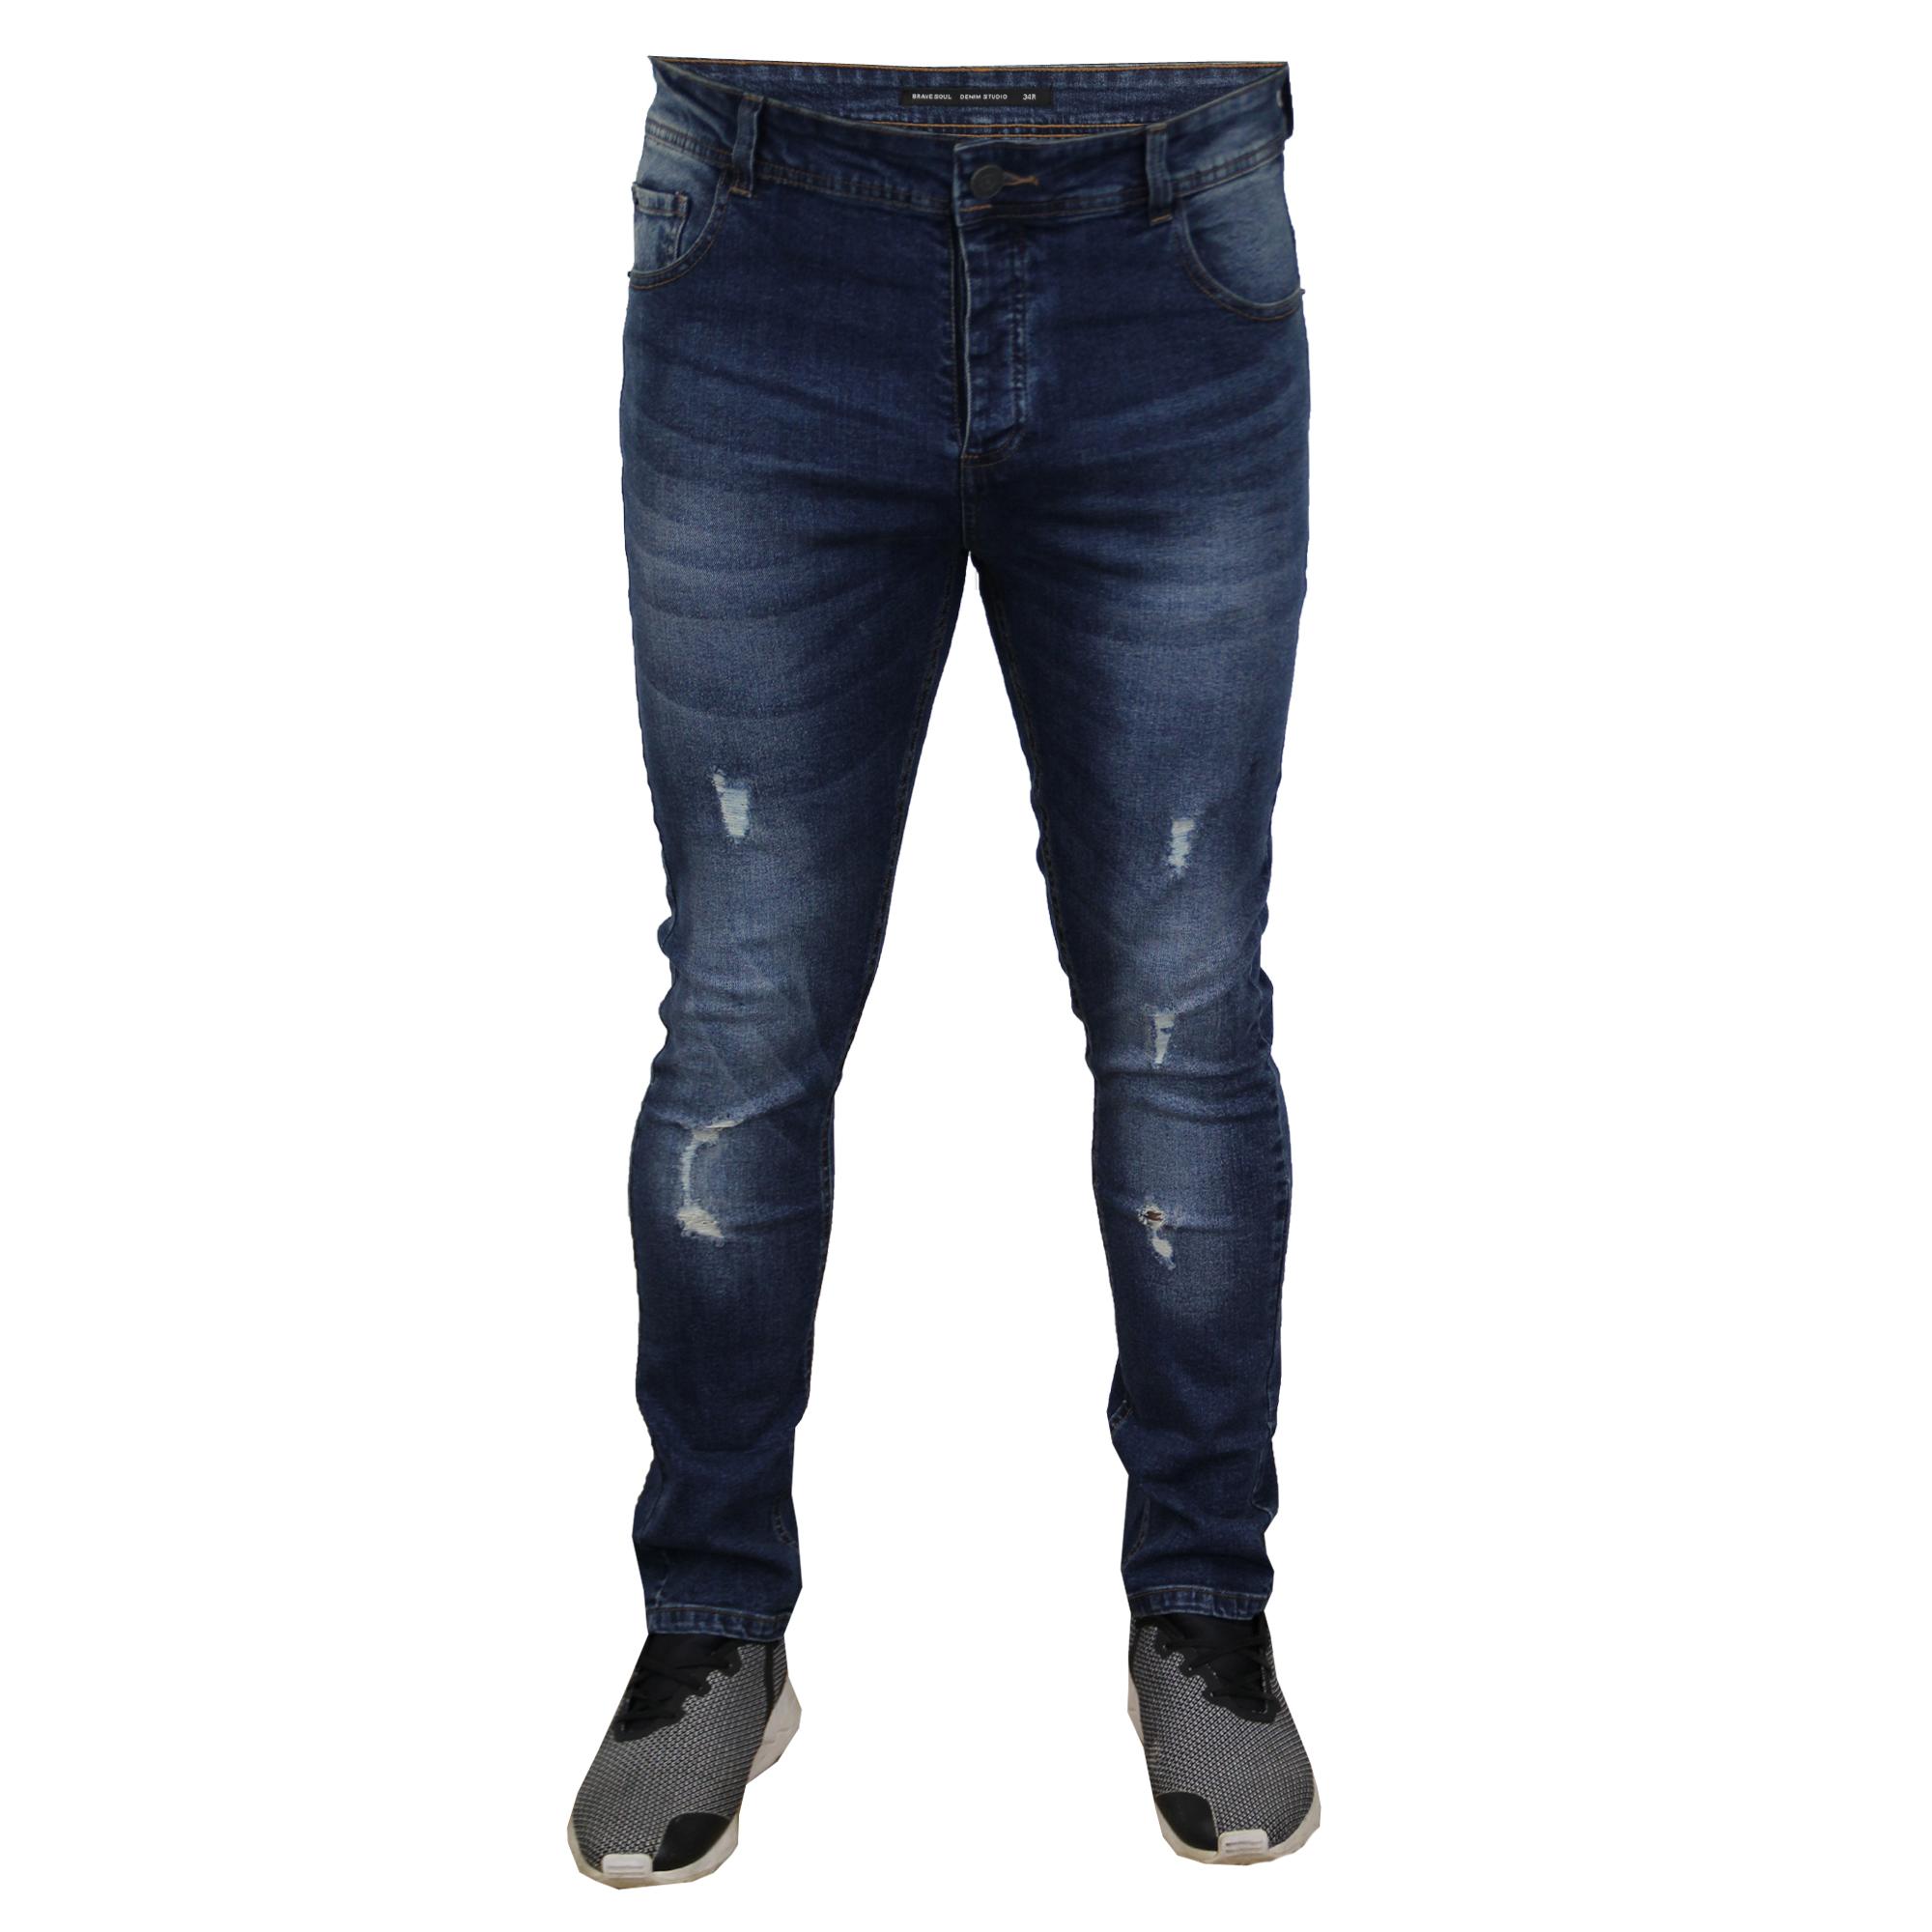 herren zerrissen jeans brave soul ortiz enge passform. Black Bedroom Furniture Sets. Home Design Ideas